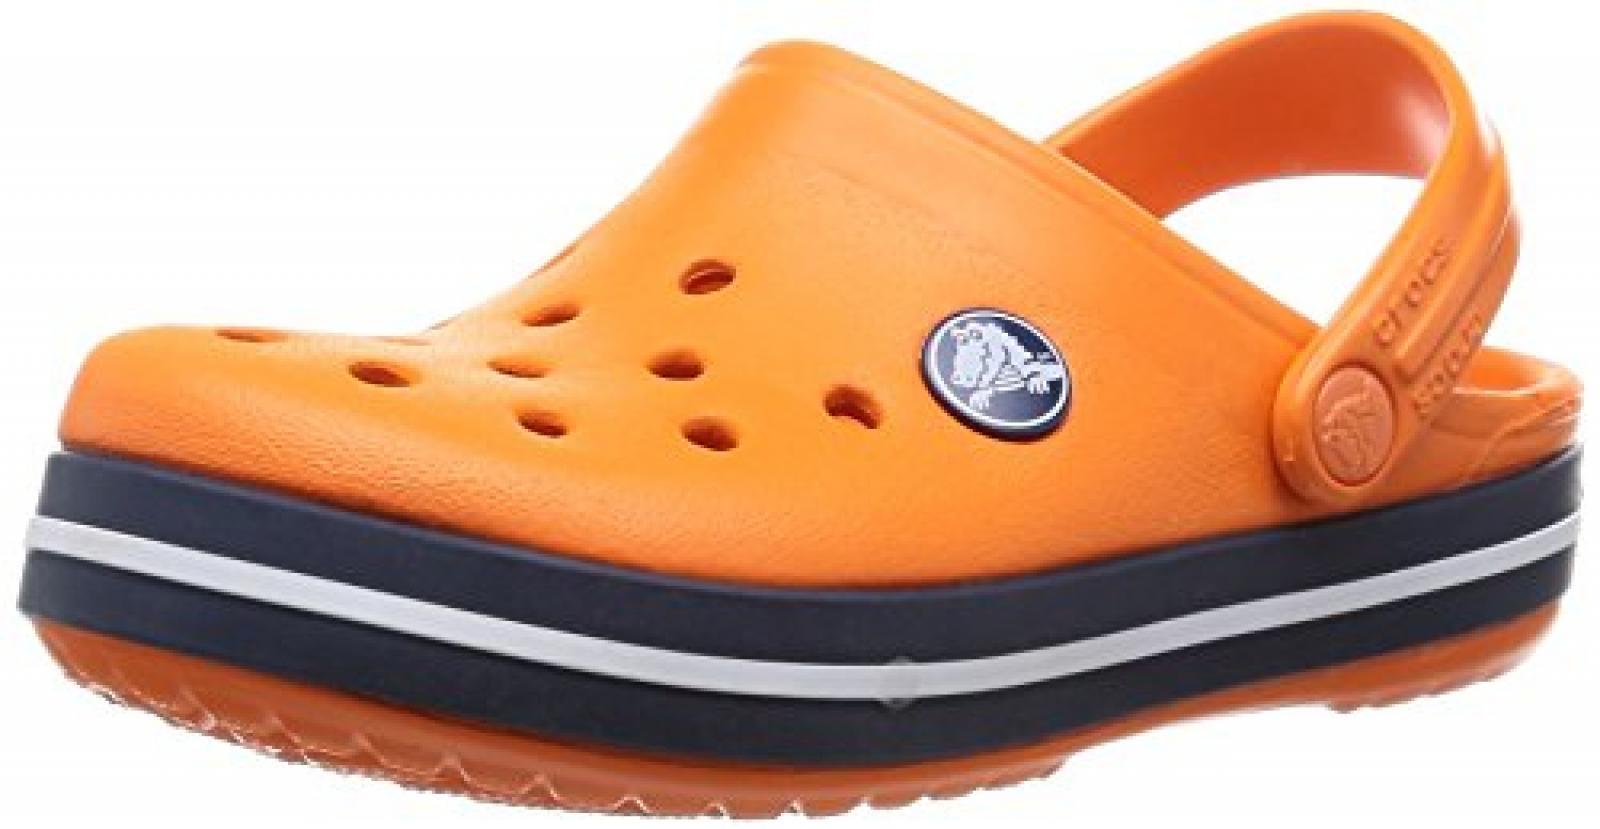 crocs Crocband Kids 10998-410 Unisex - Kinder Clogs